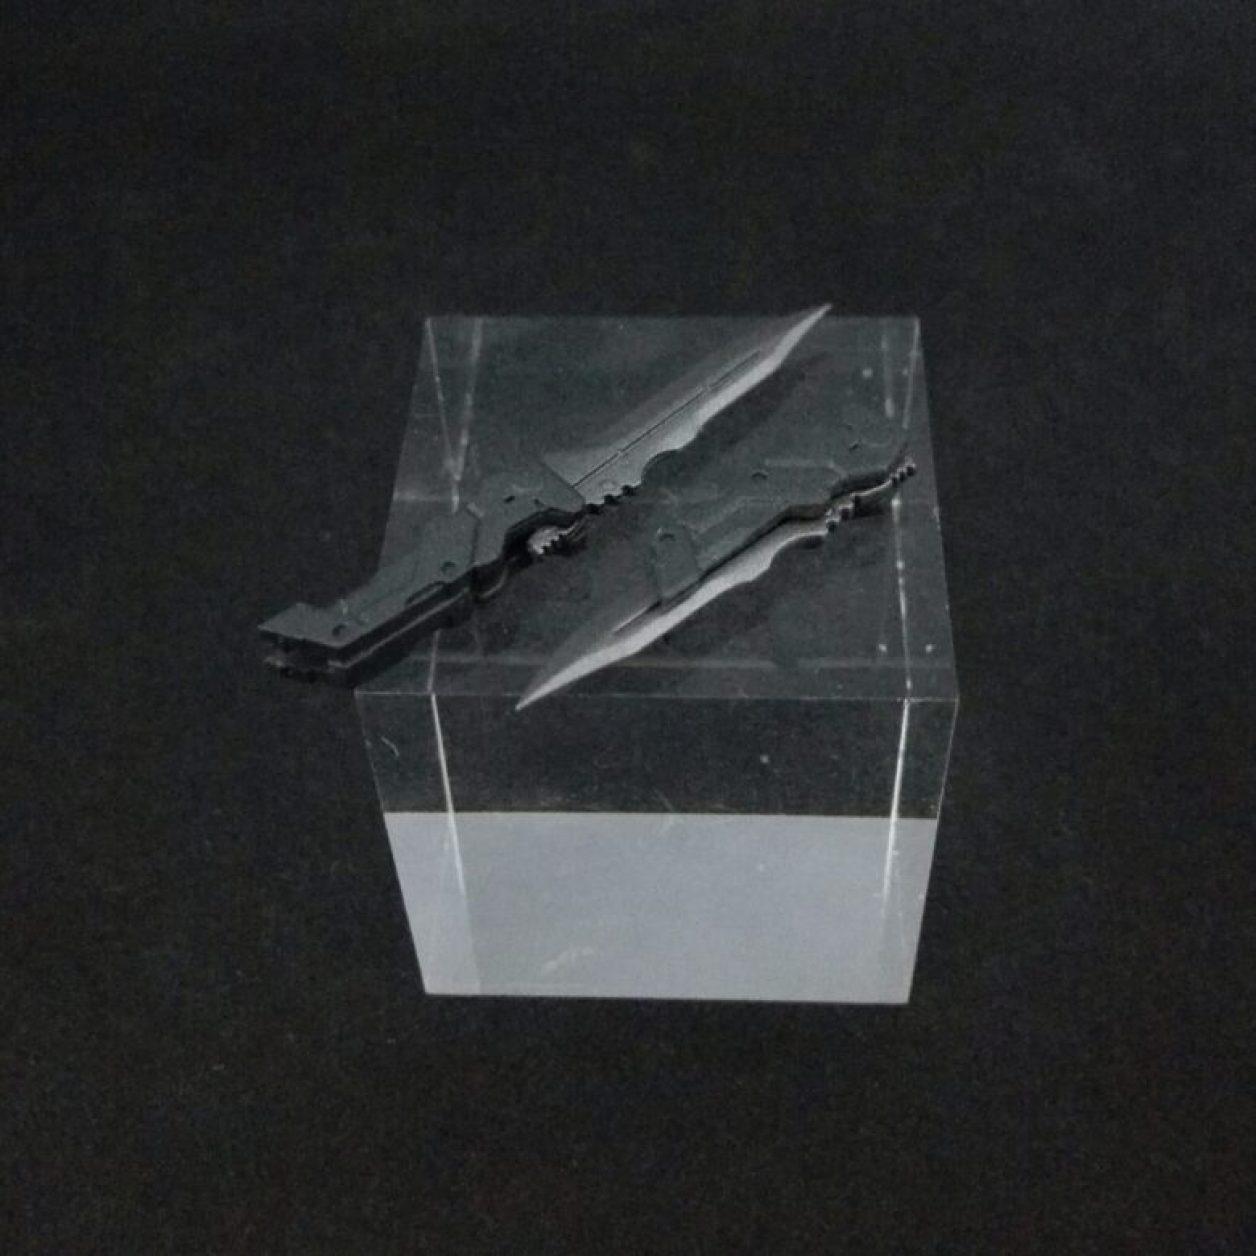 METAL BUILED(メタルビルド)エールストライクガンダムのアーマーシュナイダーの画像